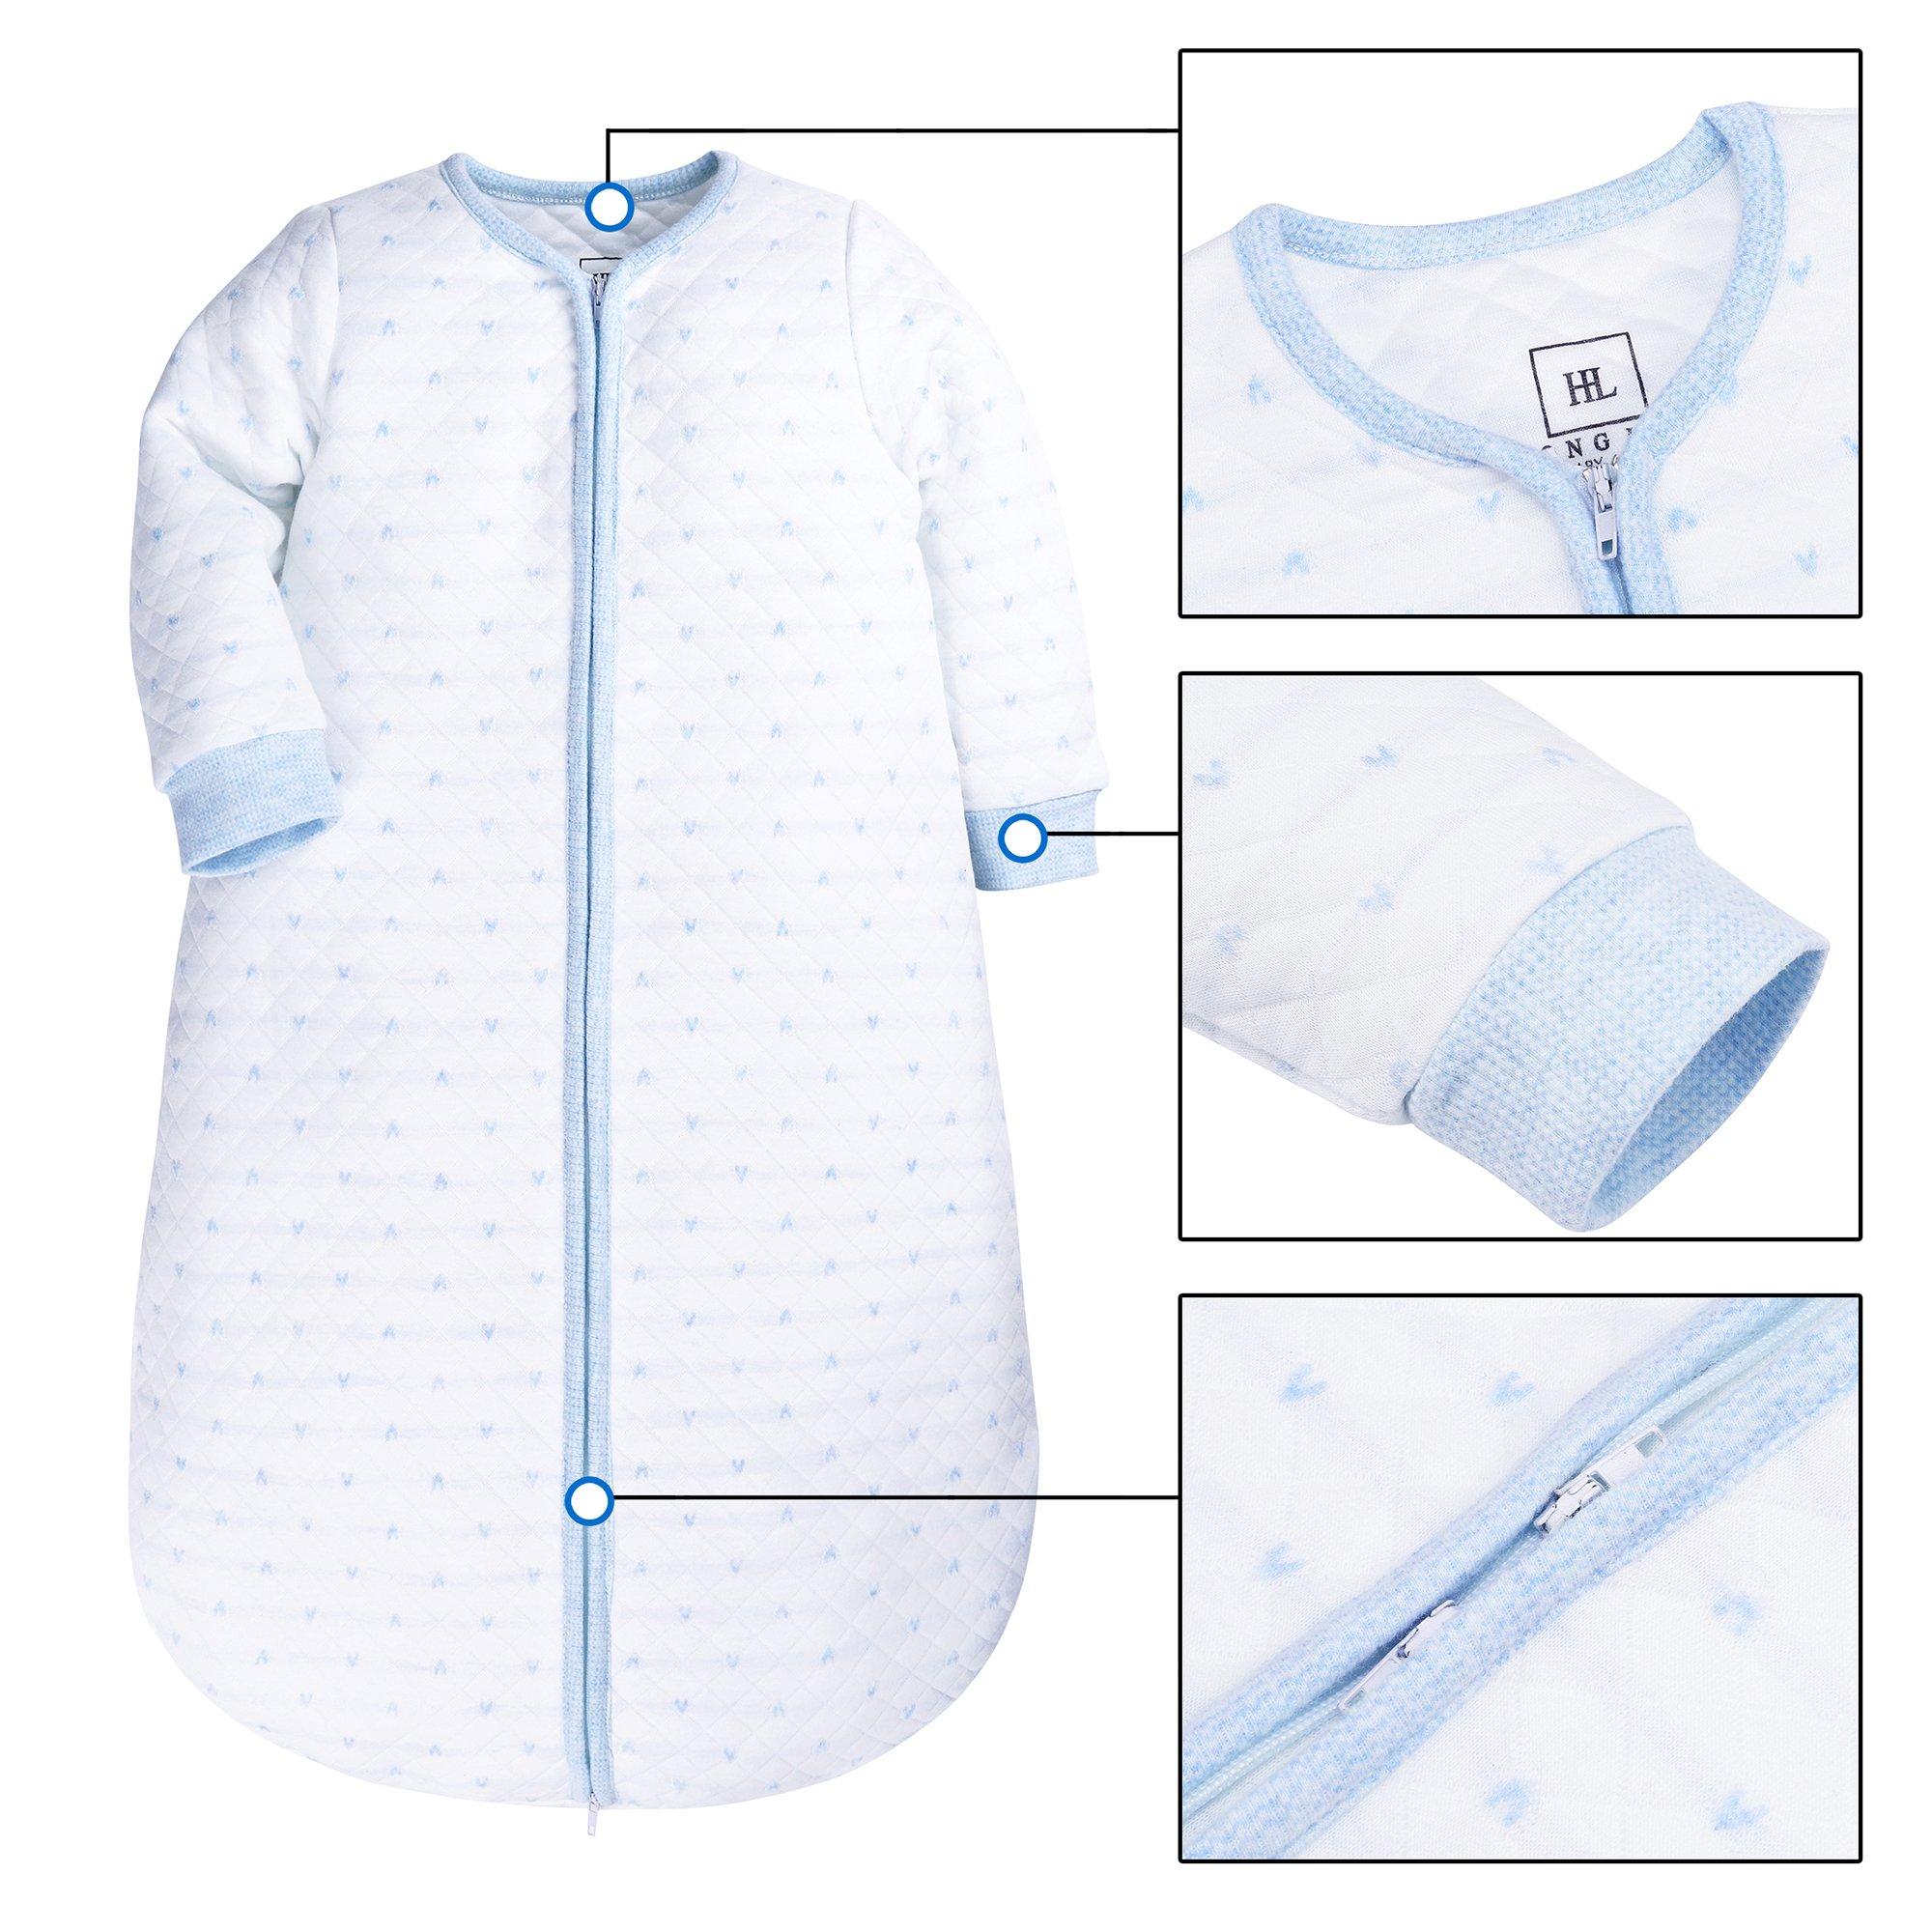 SHENGWEN Baby Sleep Sack Boys Girls Sleeping Bag Wearable Blanket Winter (BlueDots, 0-6m) by SHENGWEN (Image #2)